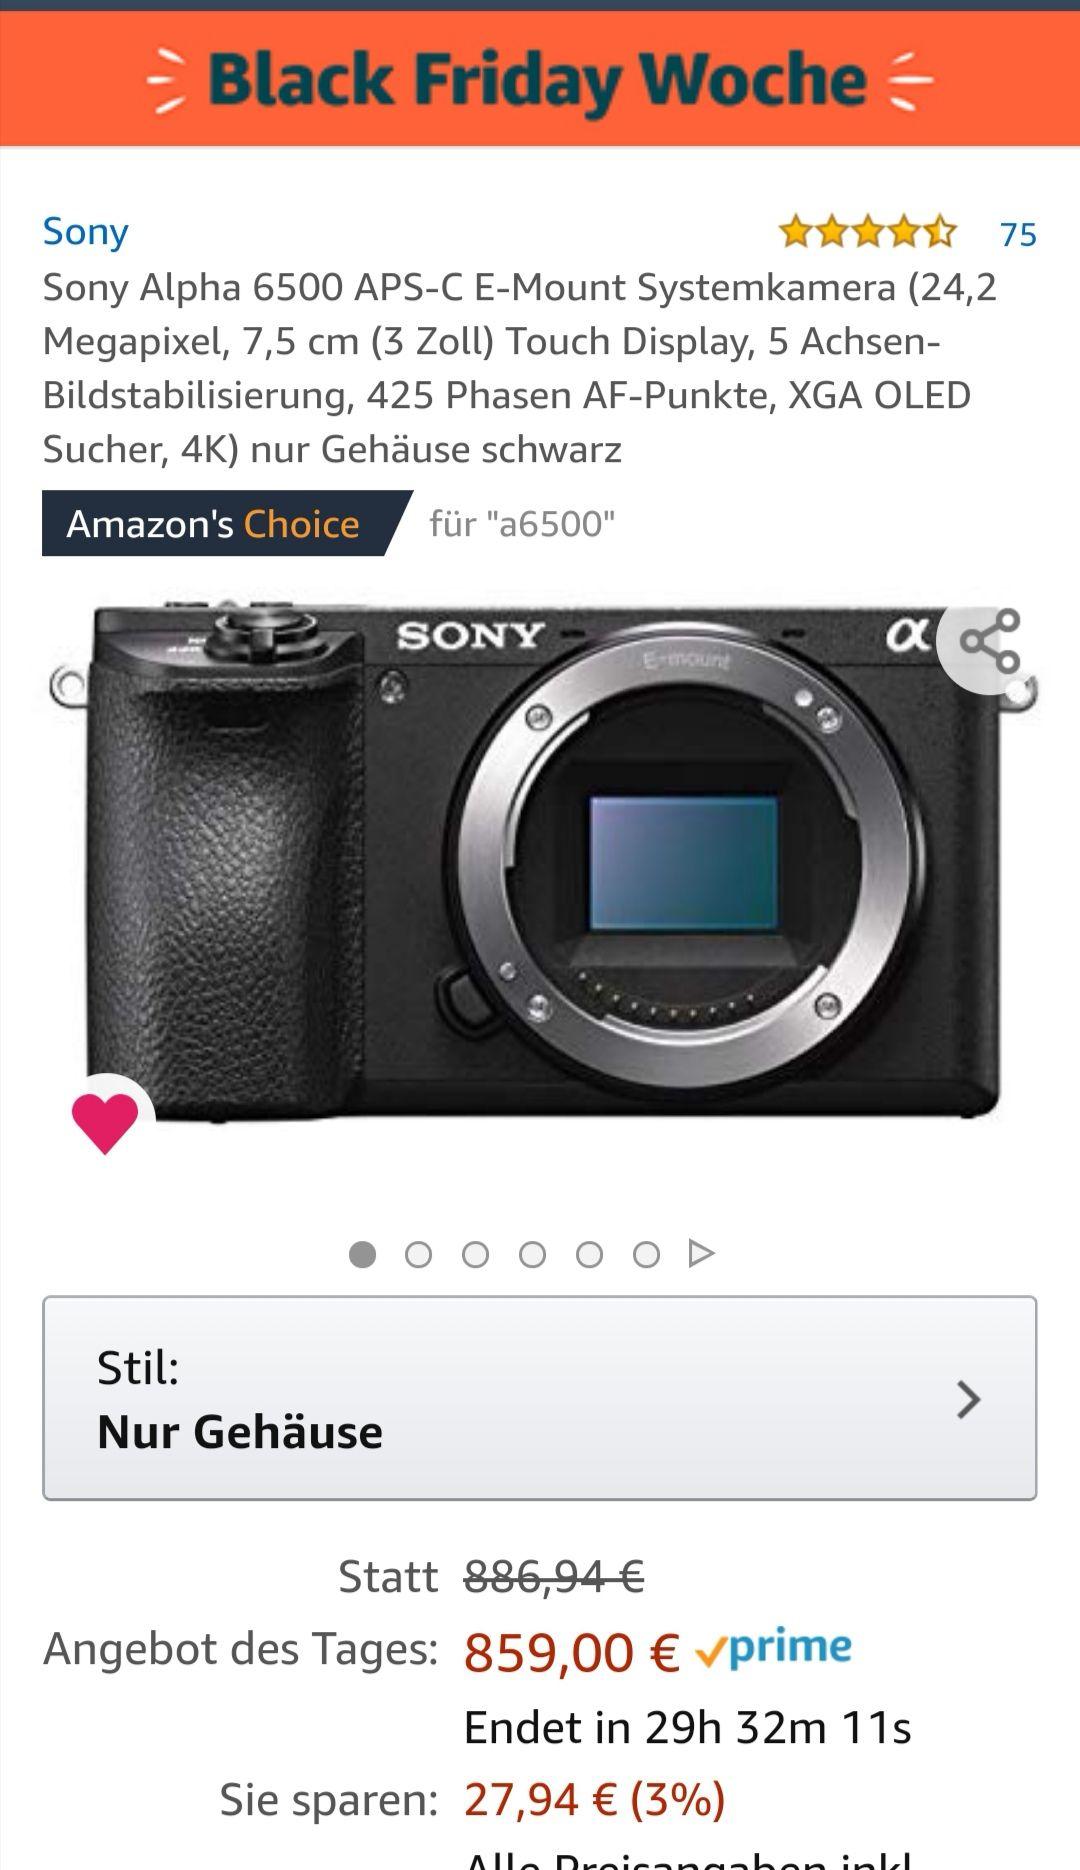 Sony Alpha 6500 BF Deal Amazon